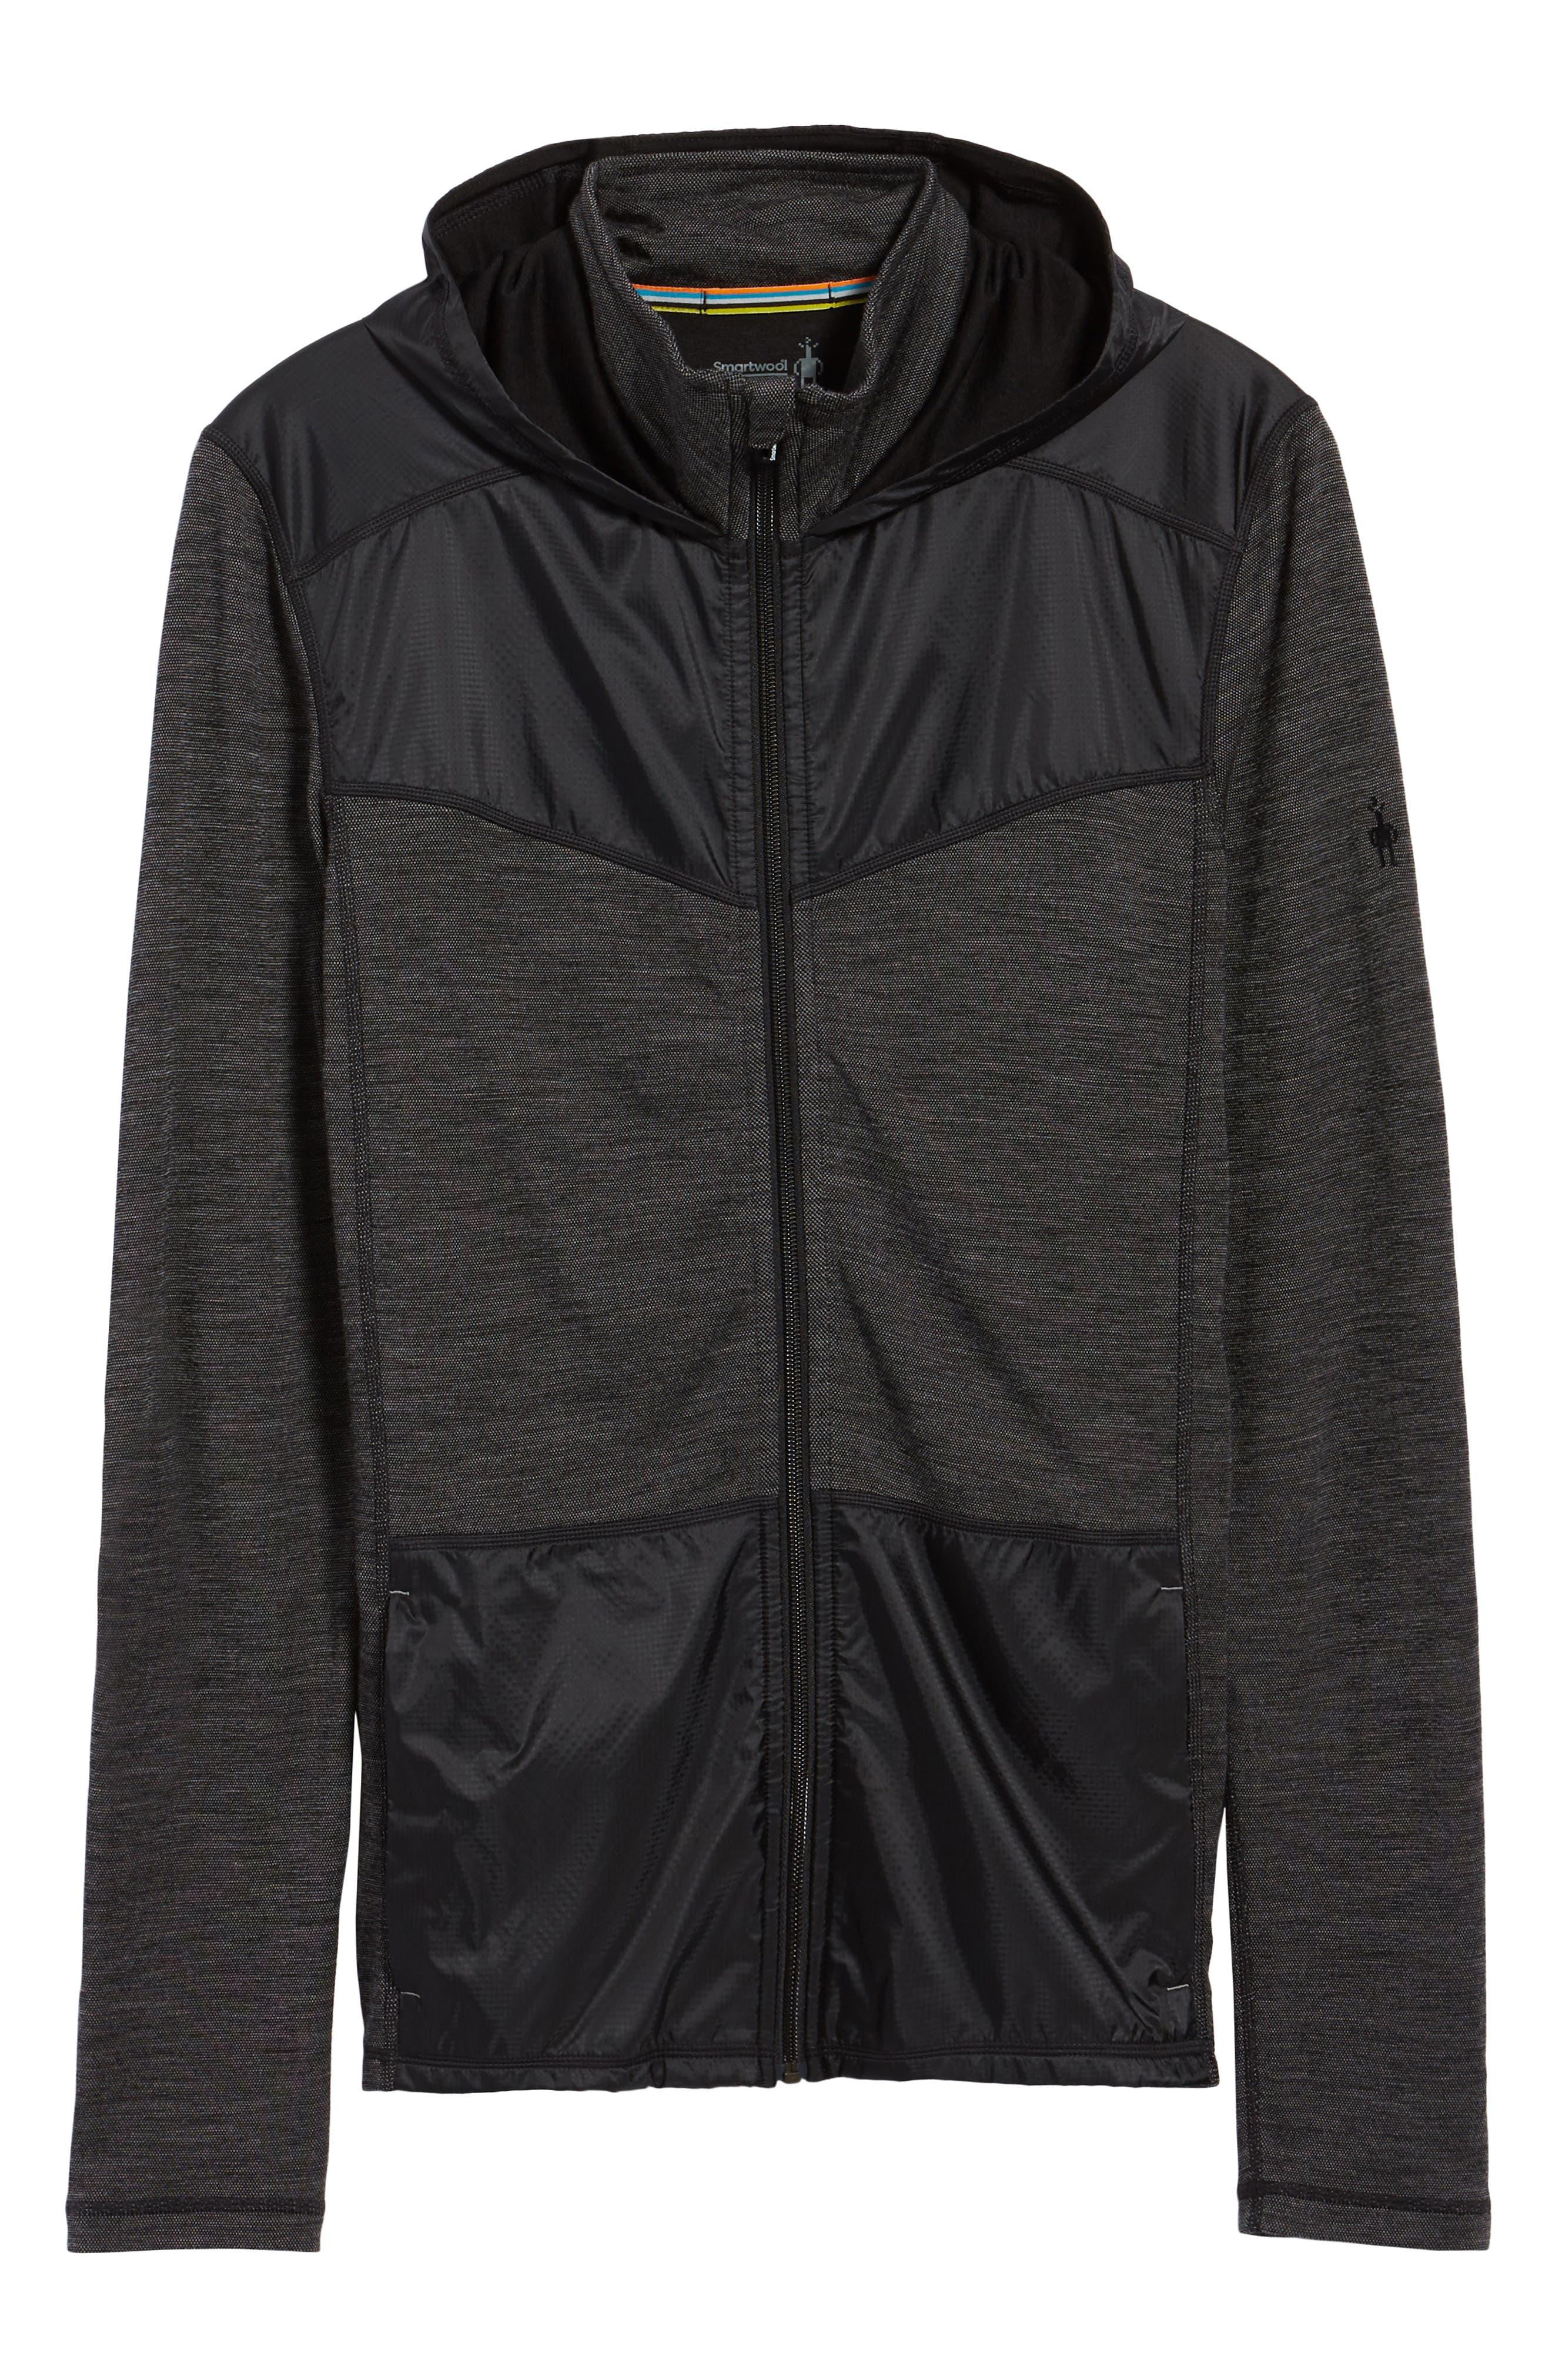 250 Sport Merino Wool Jacket,                             Alternate thumbnail 6, color,                             Black